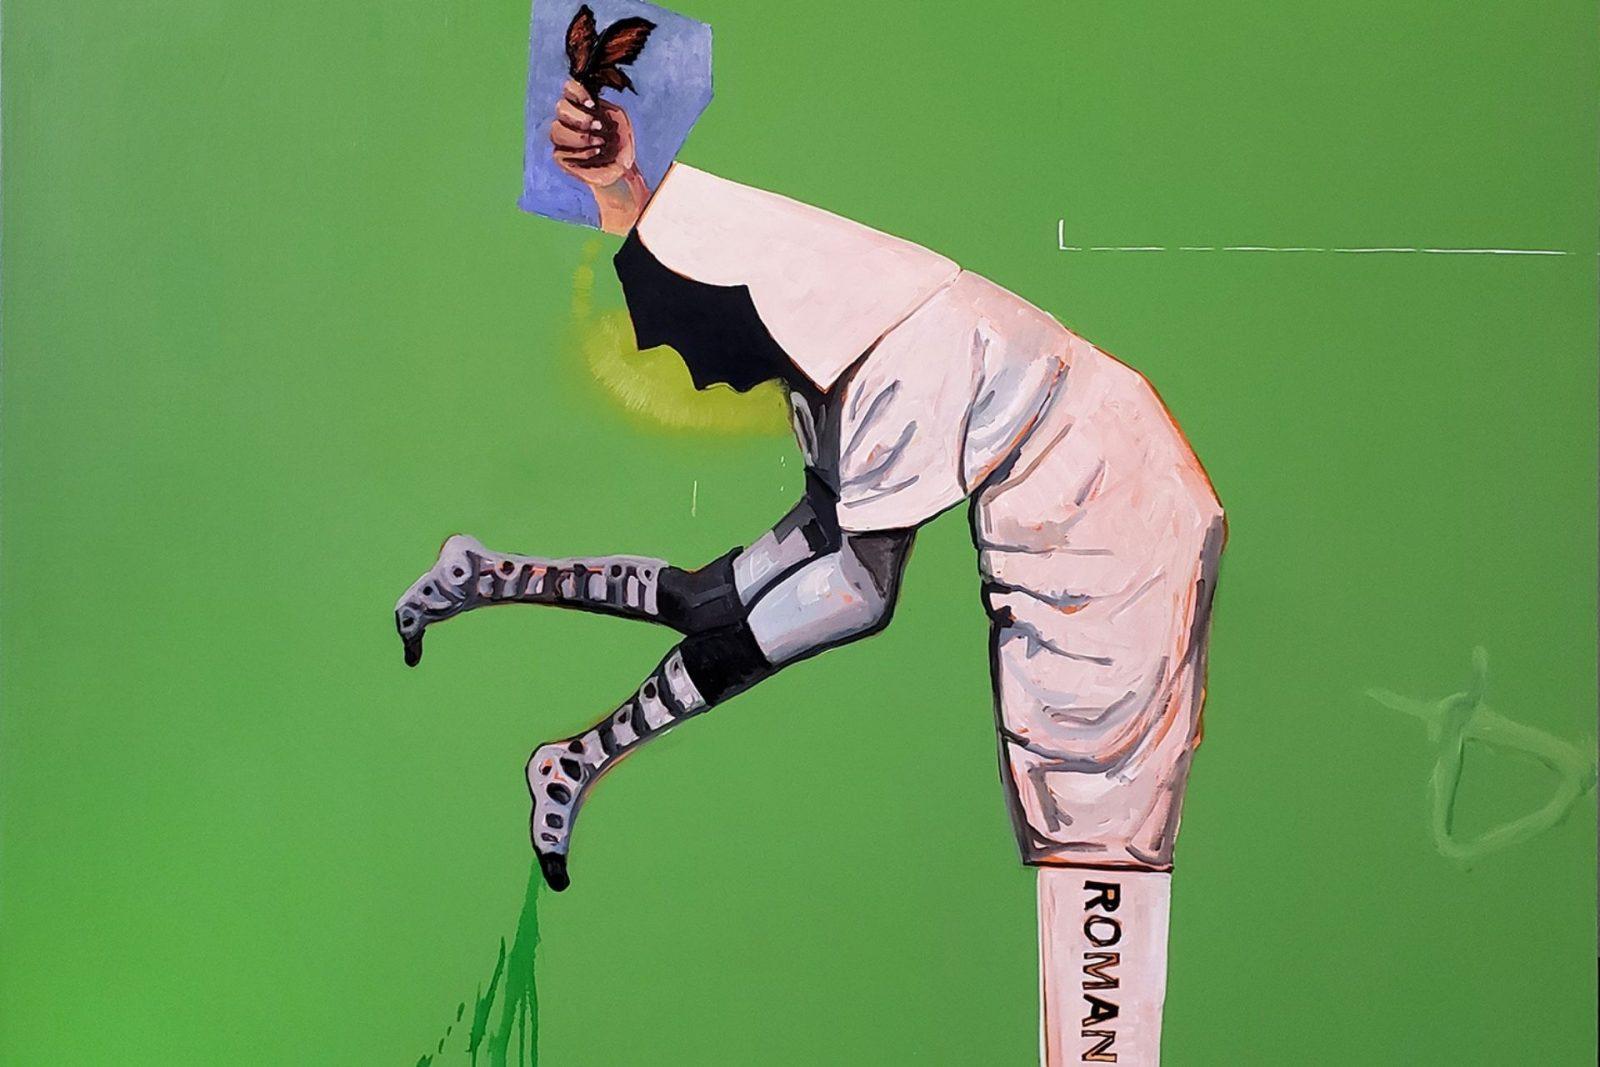 ambiguous art by Shelton Walsmith